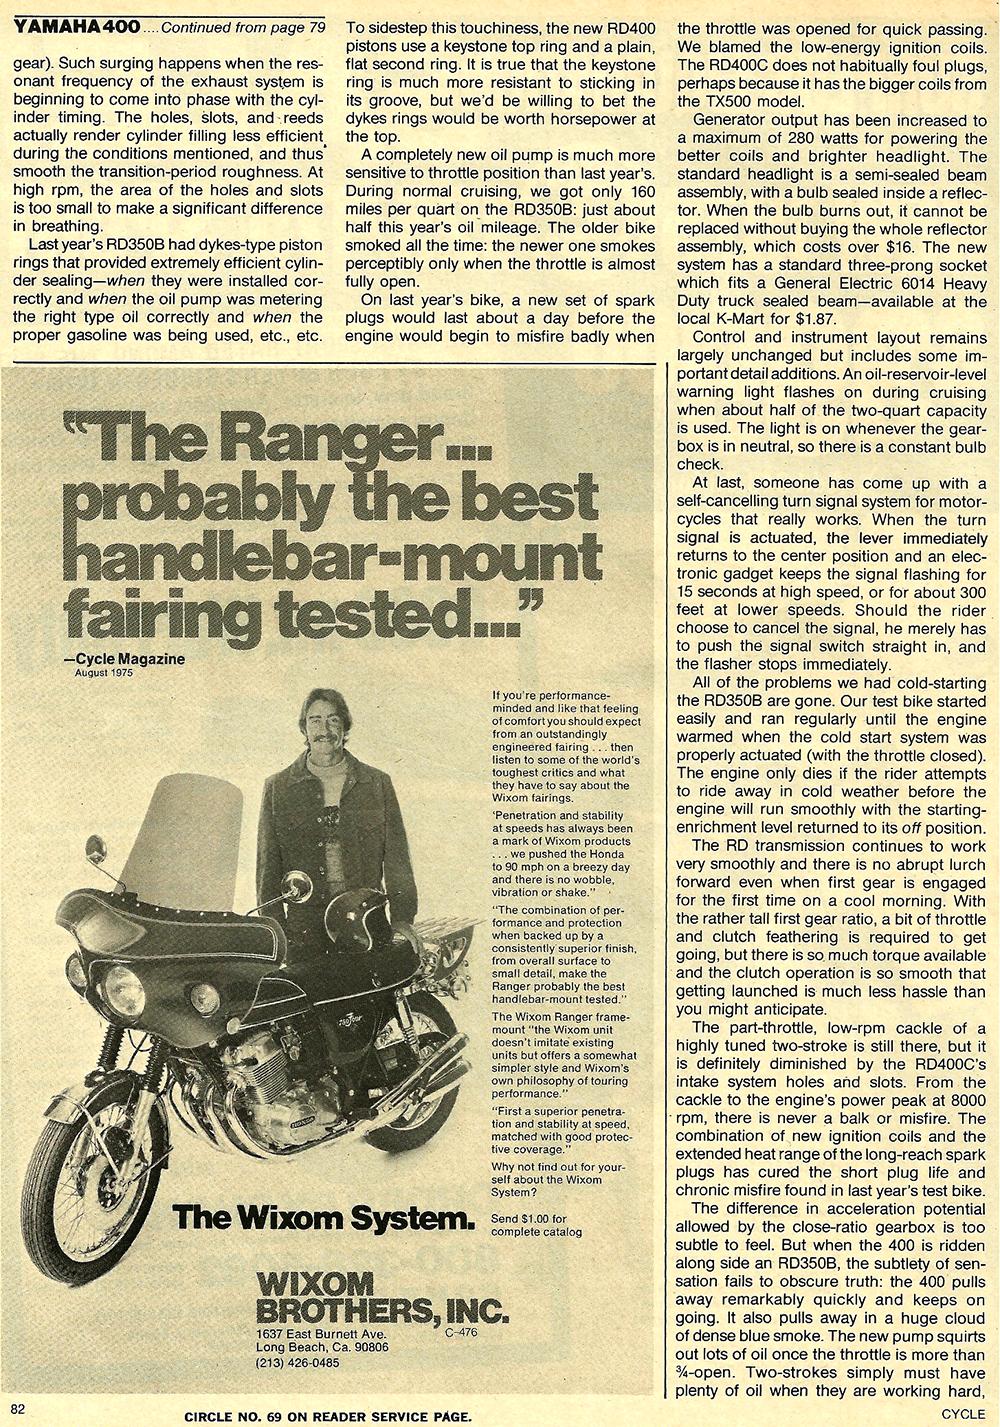 1976 Yamaha RD400C road test 7.jpg